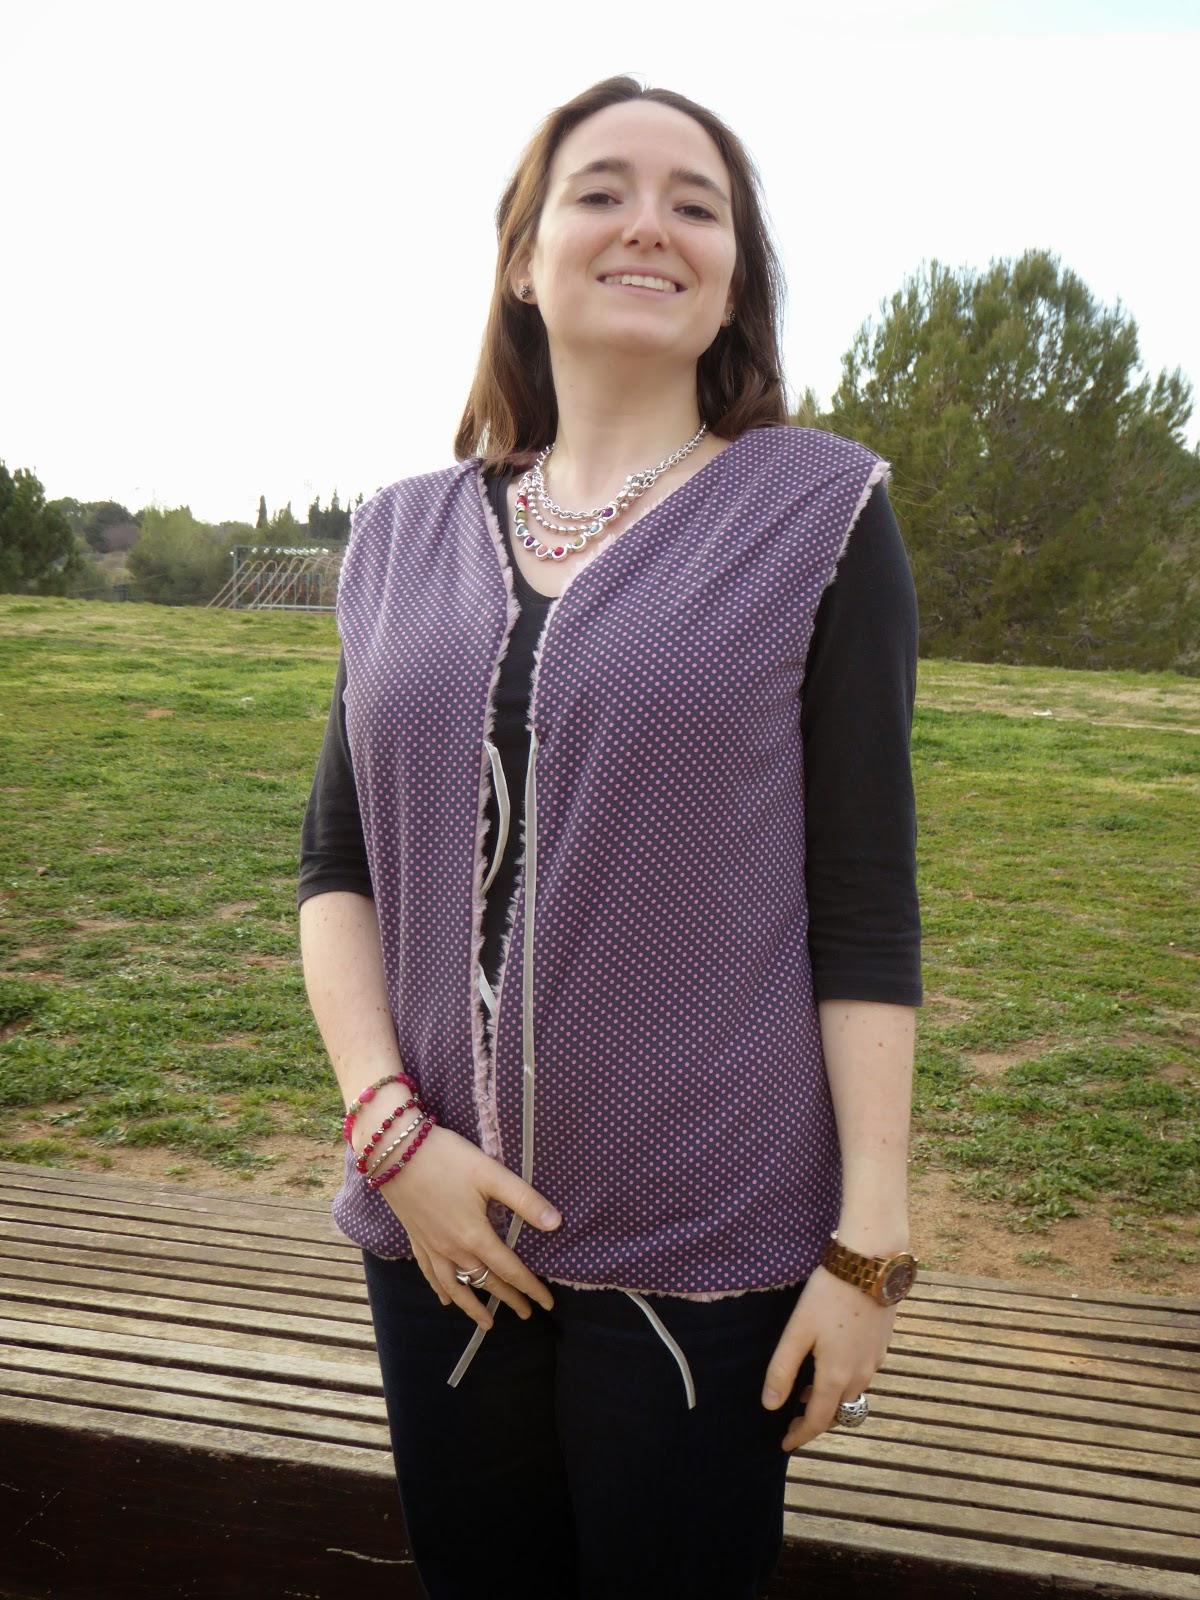 renfrew top chaleco renfrew vest fur pelo minky rosa topitos tutorial traetela modistilla de pacotilla diy